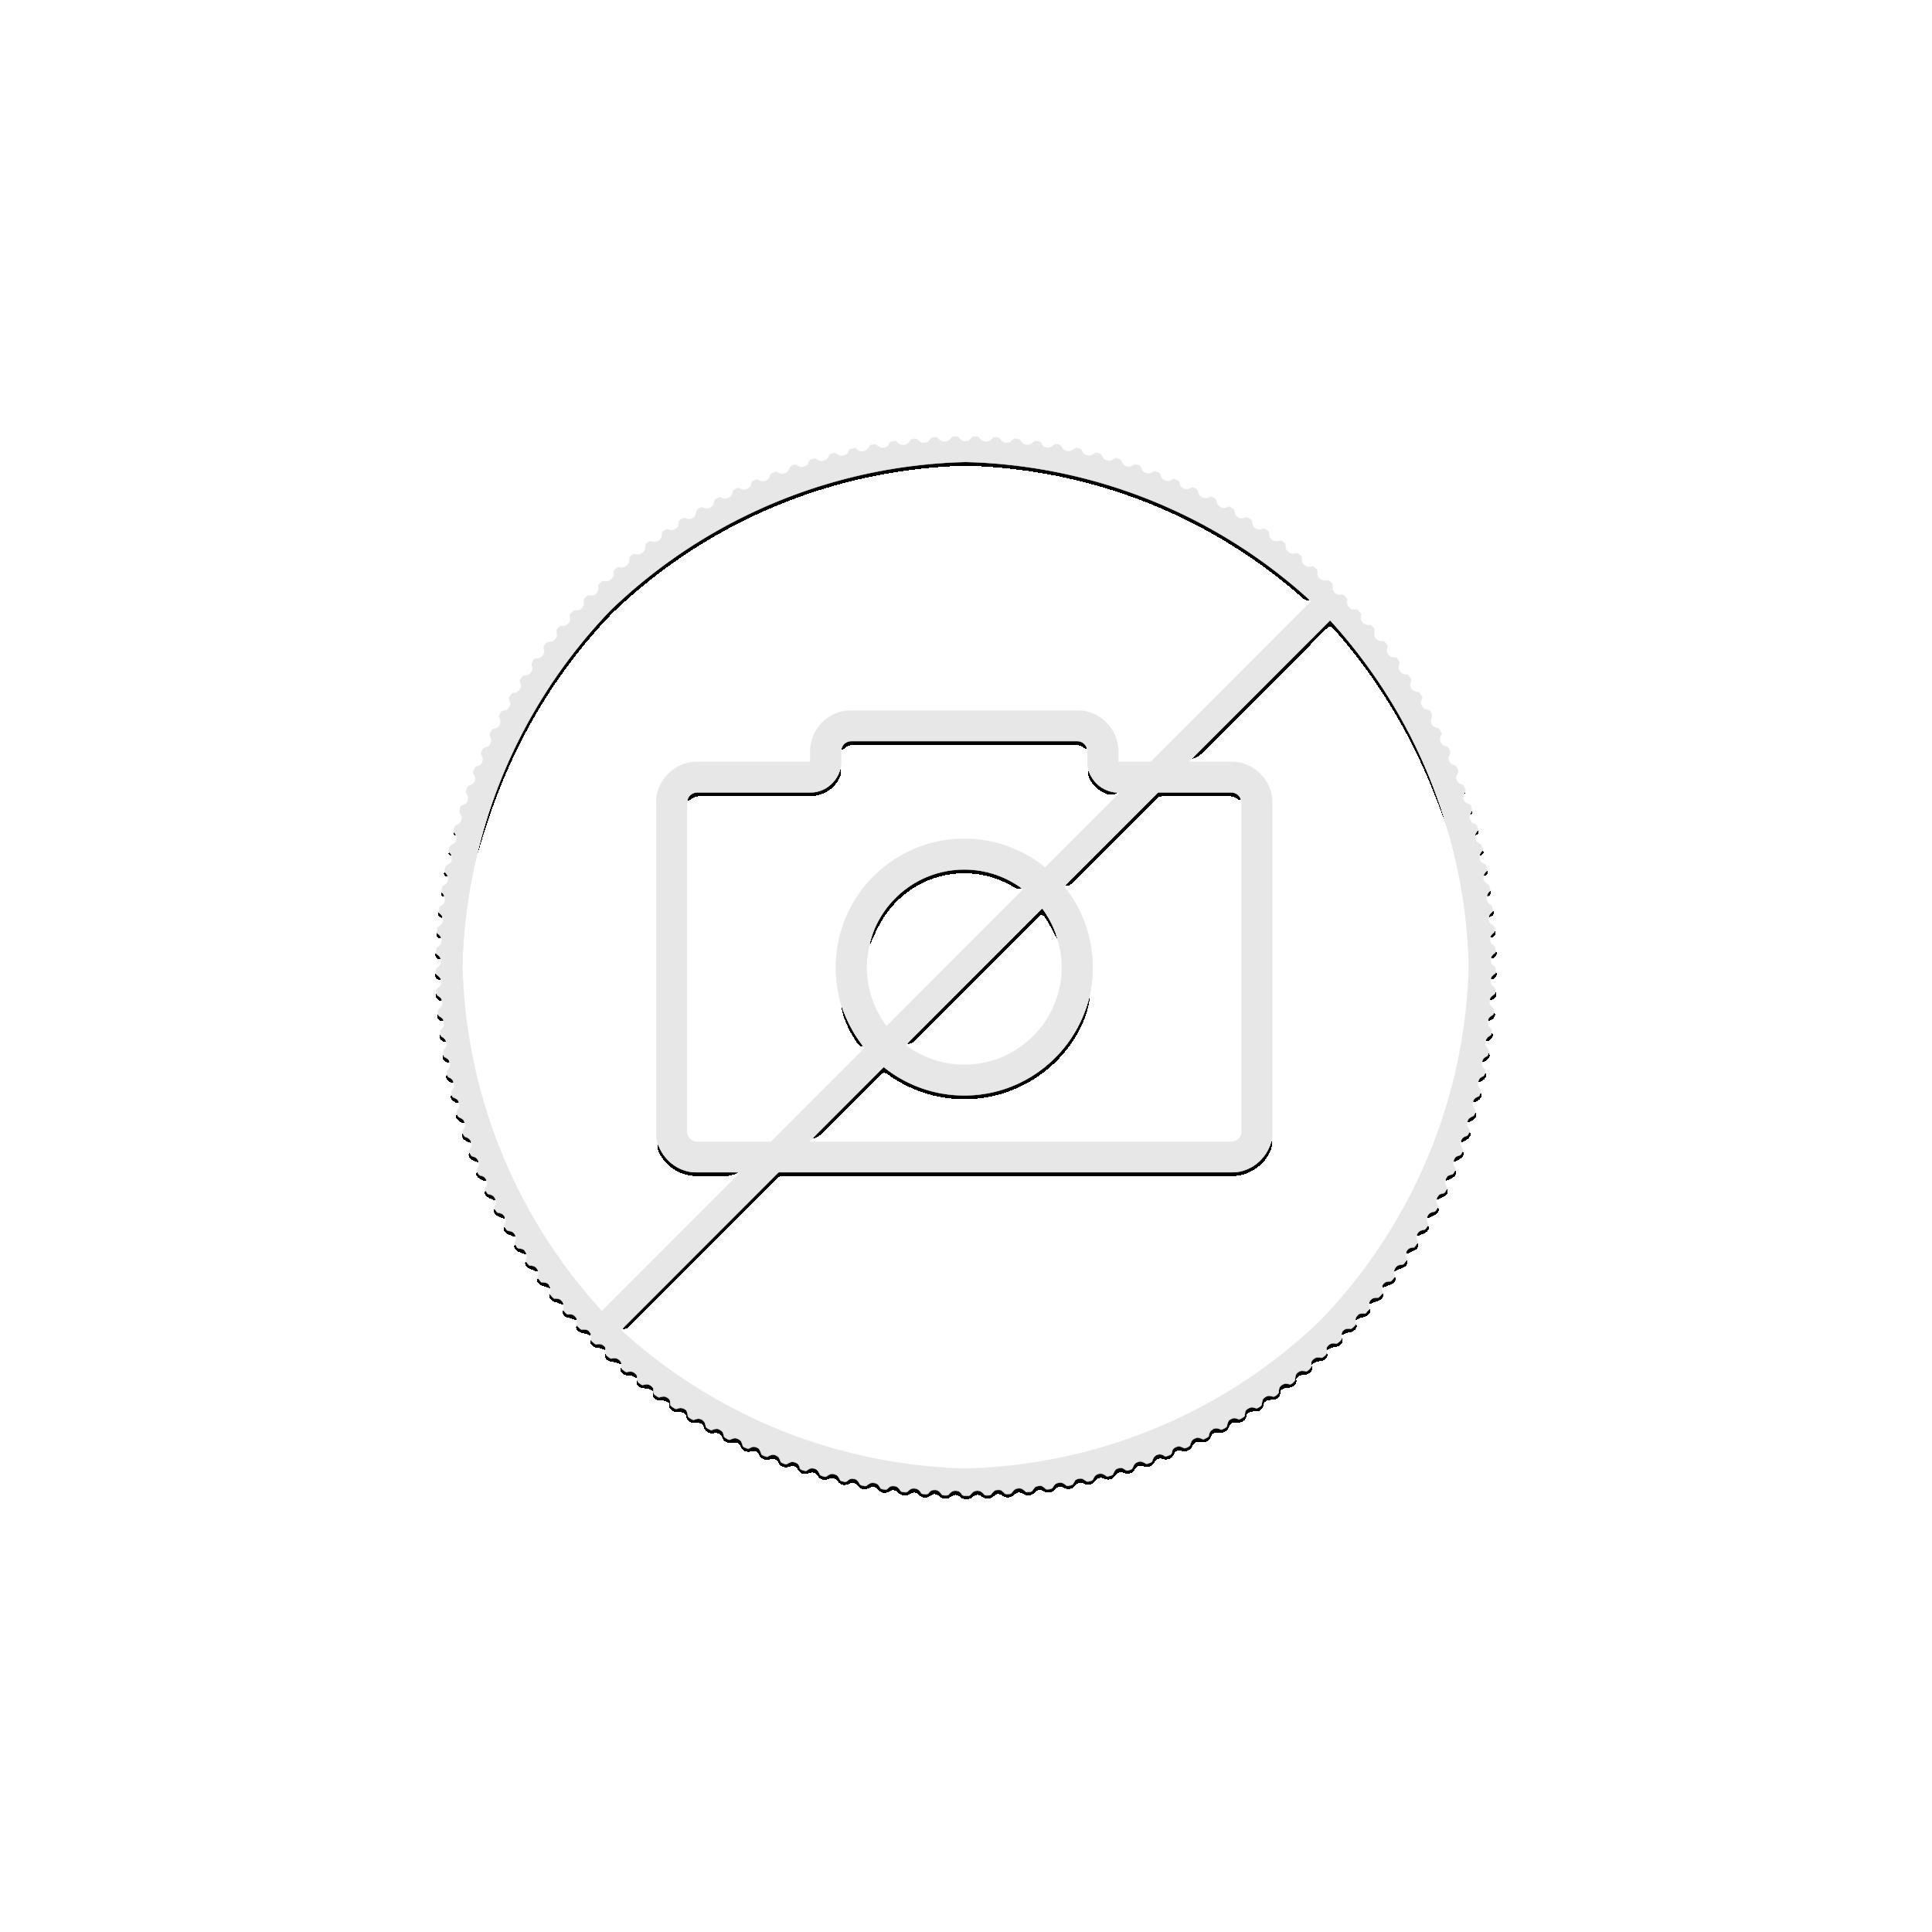 Vienna Philharmonic coin 2019